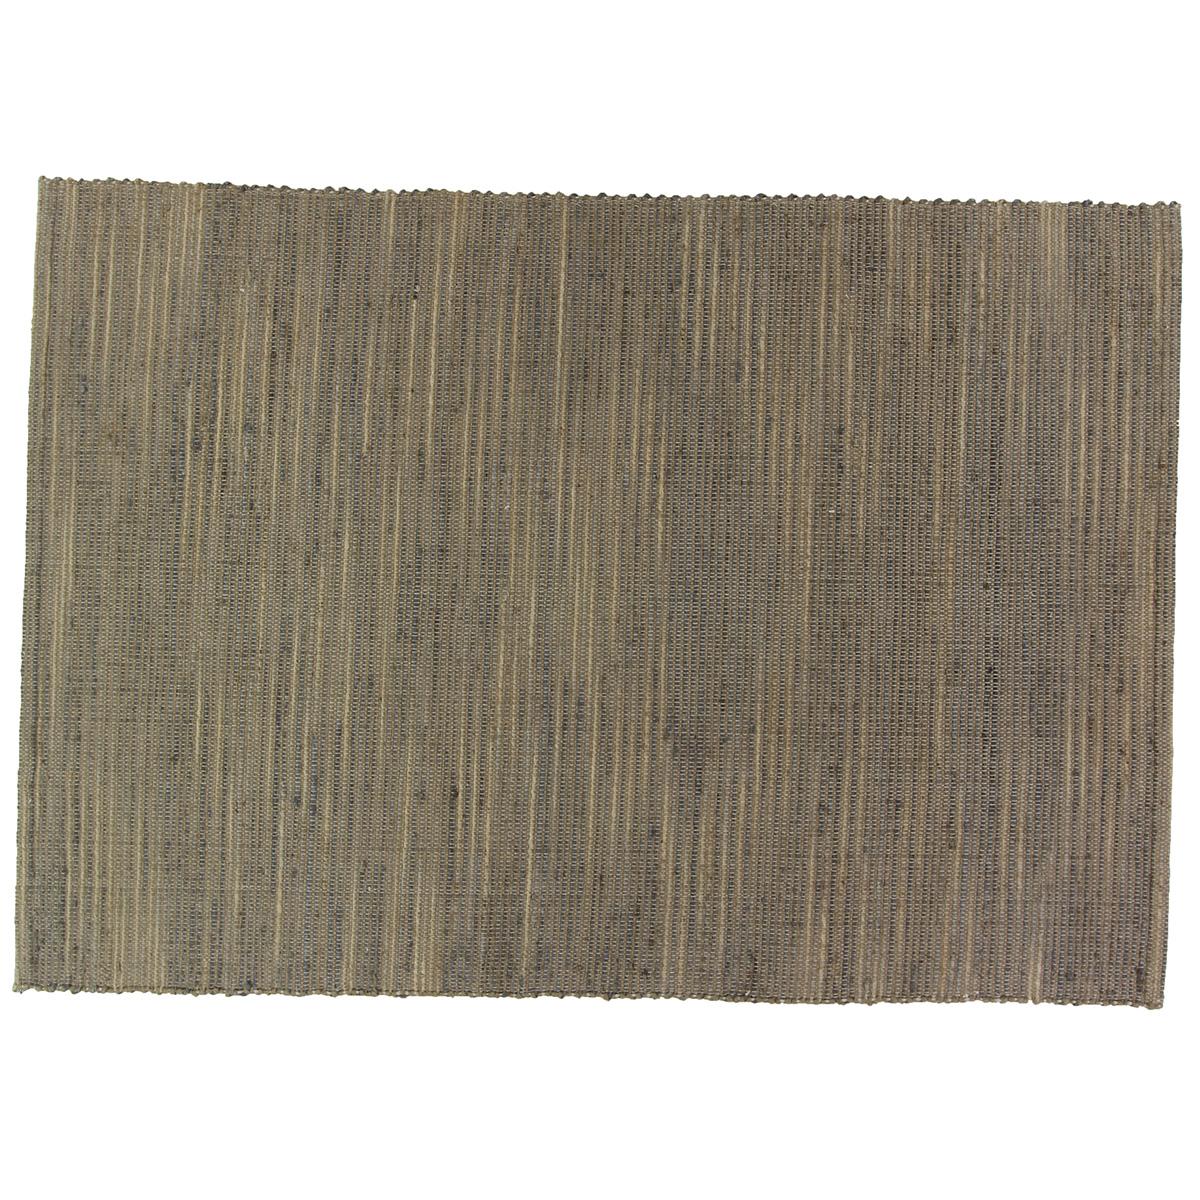 Vloerkleed Brinker Jungle Grey | 200 x 290 cm